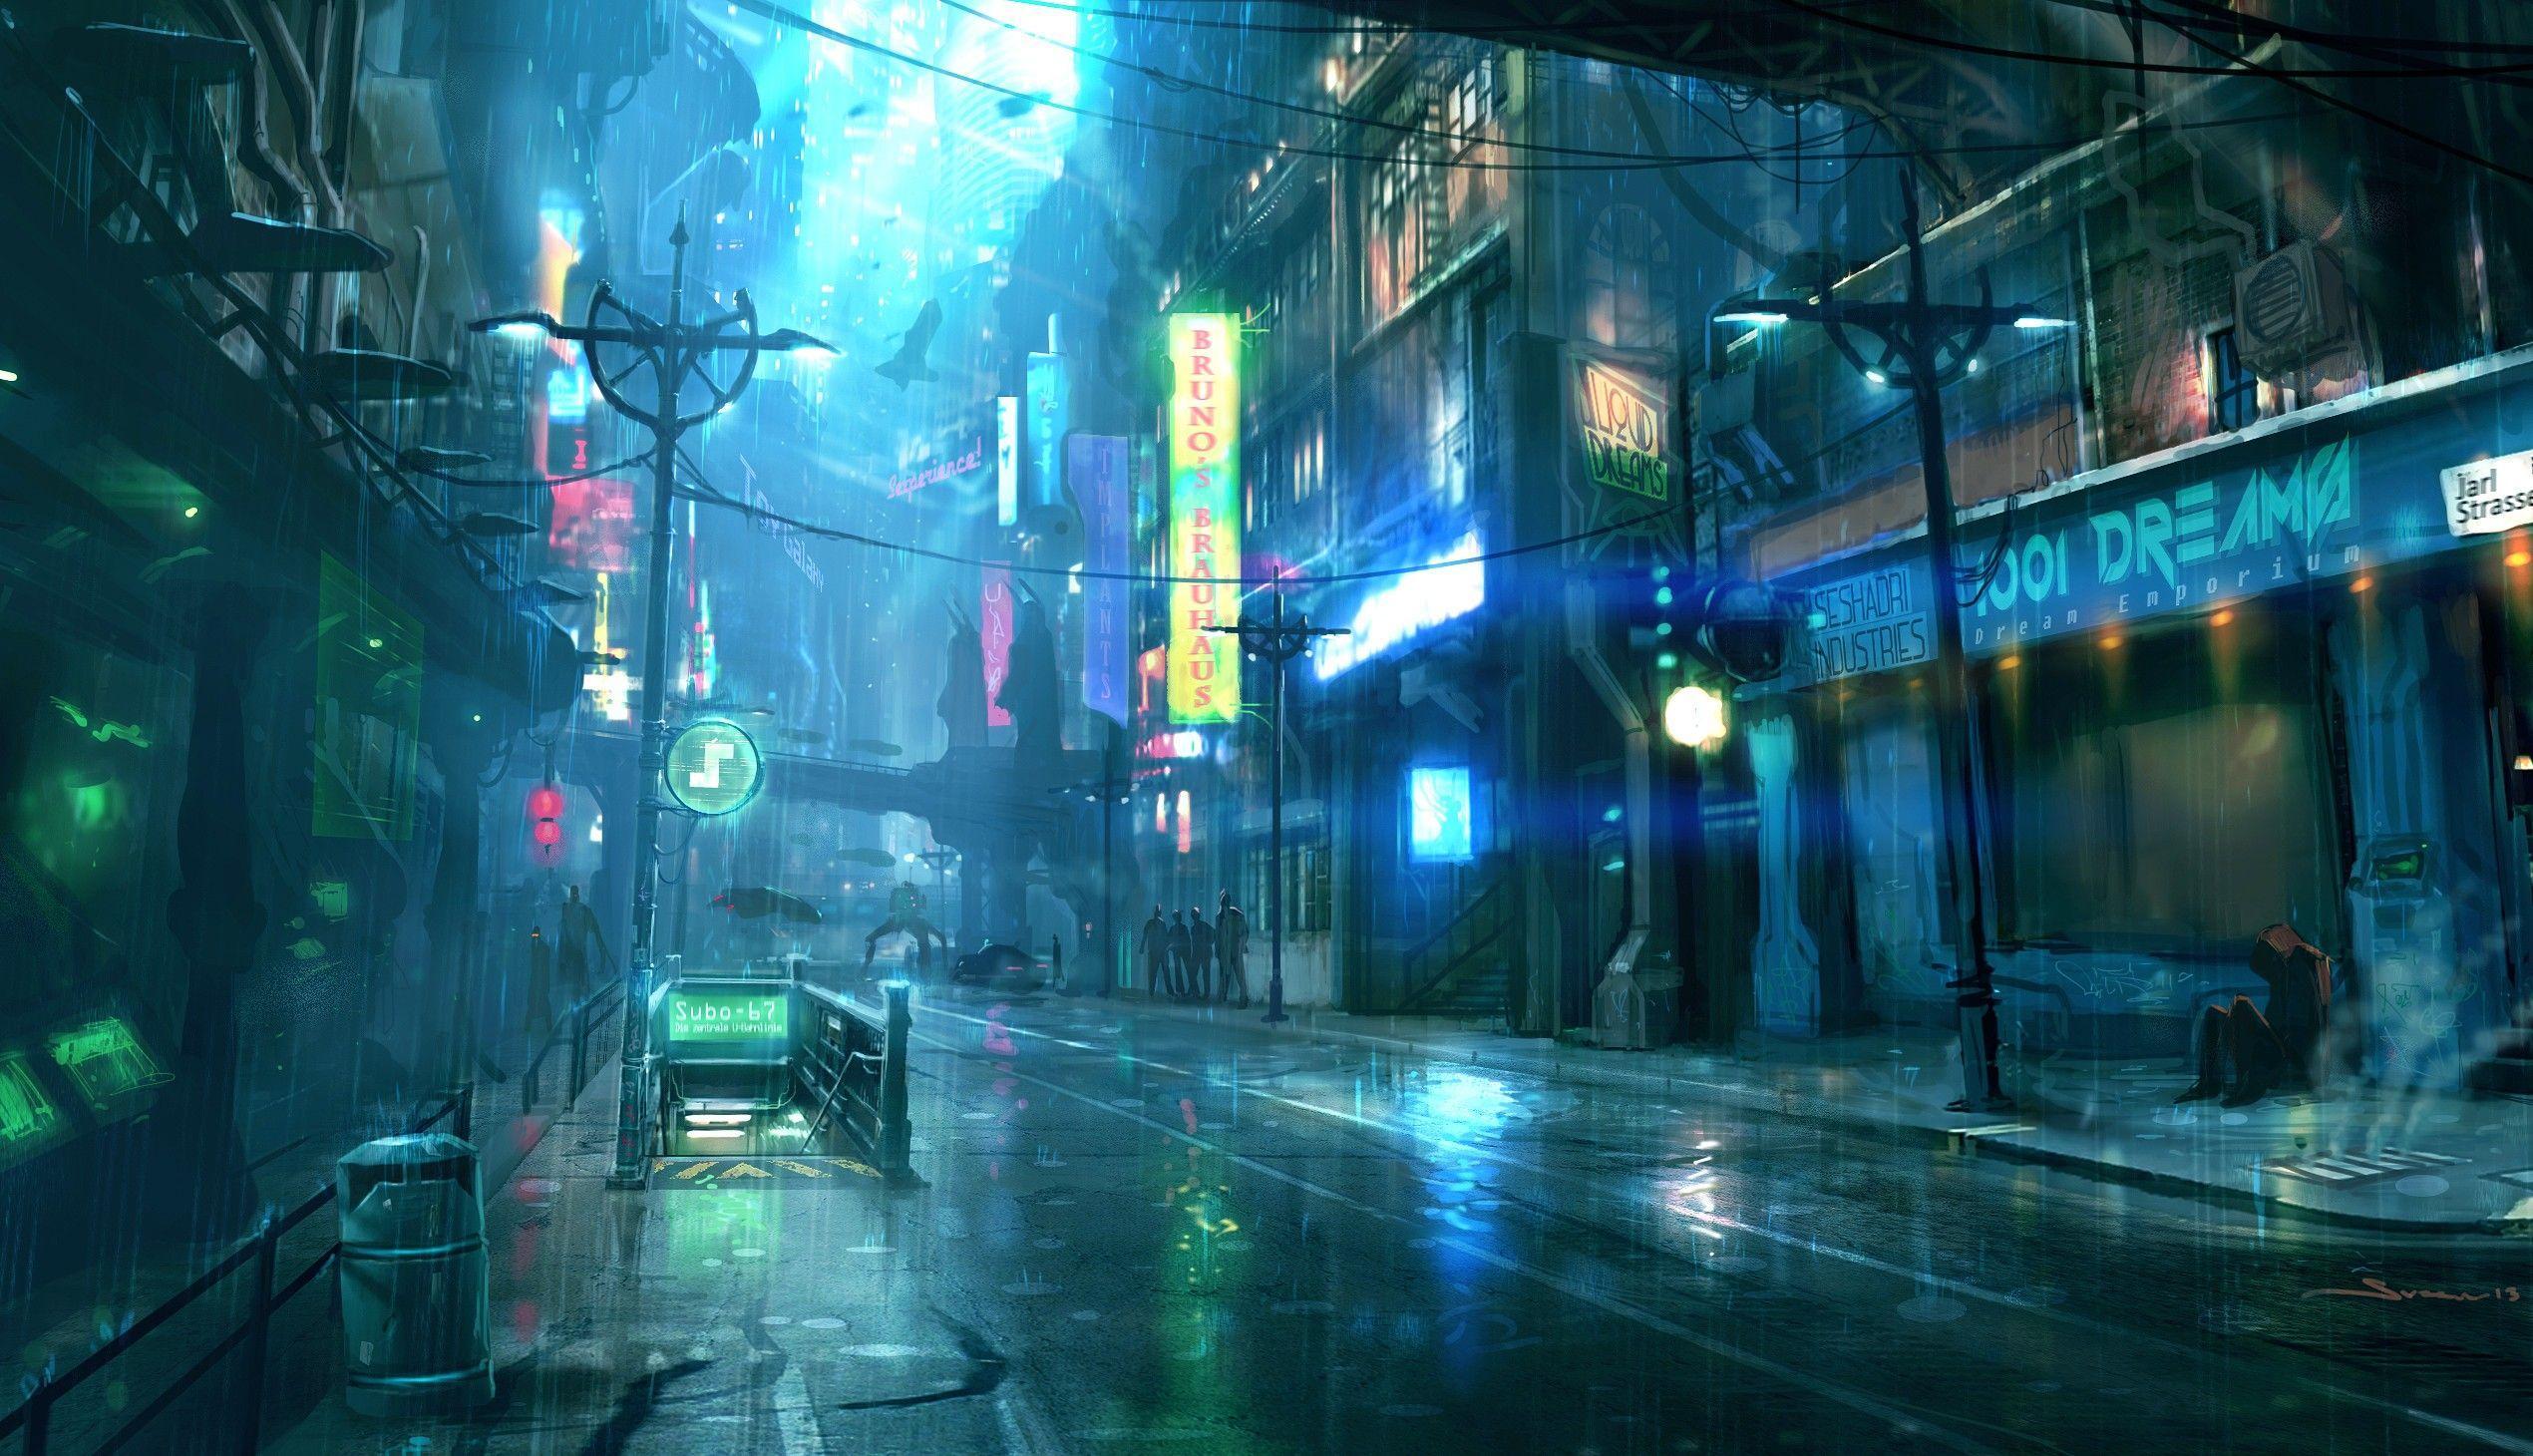 Rain Anime Wallpapers - Top Free Rain Anime Backgrounds ...